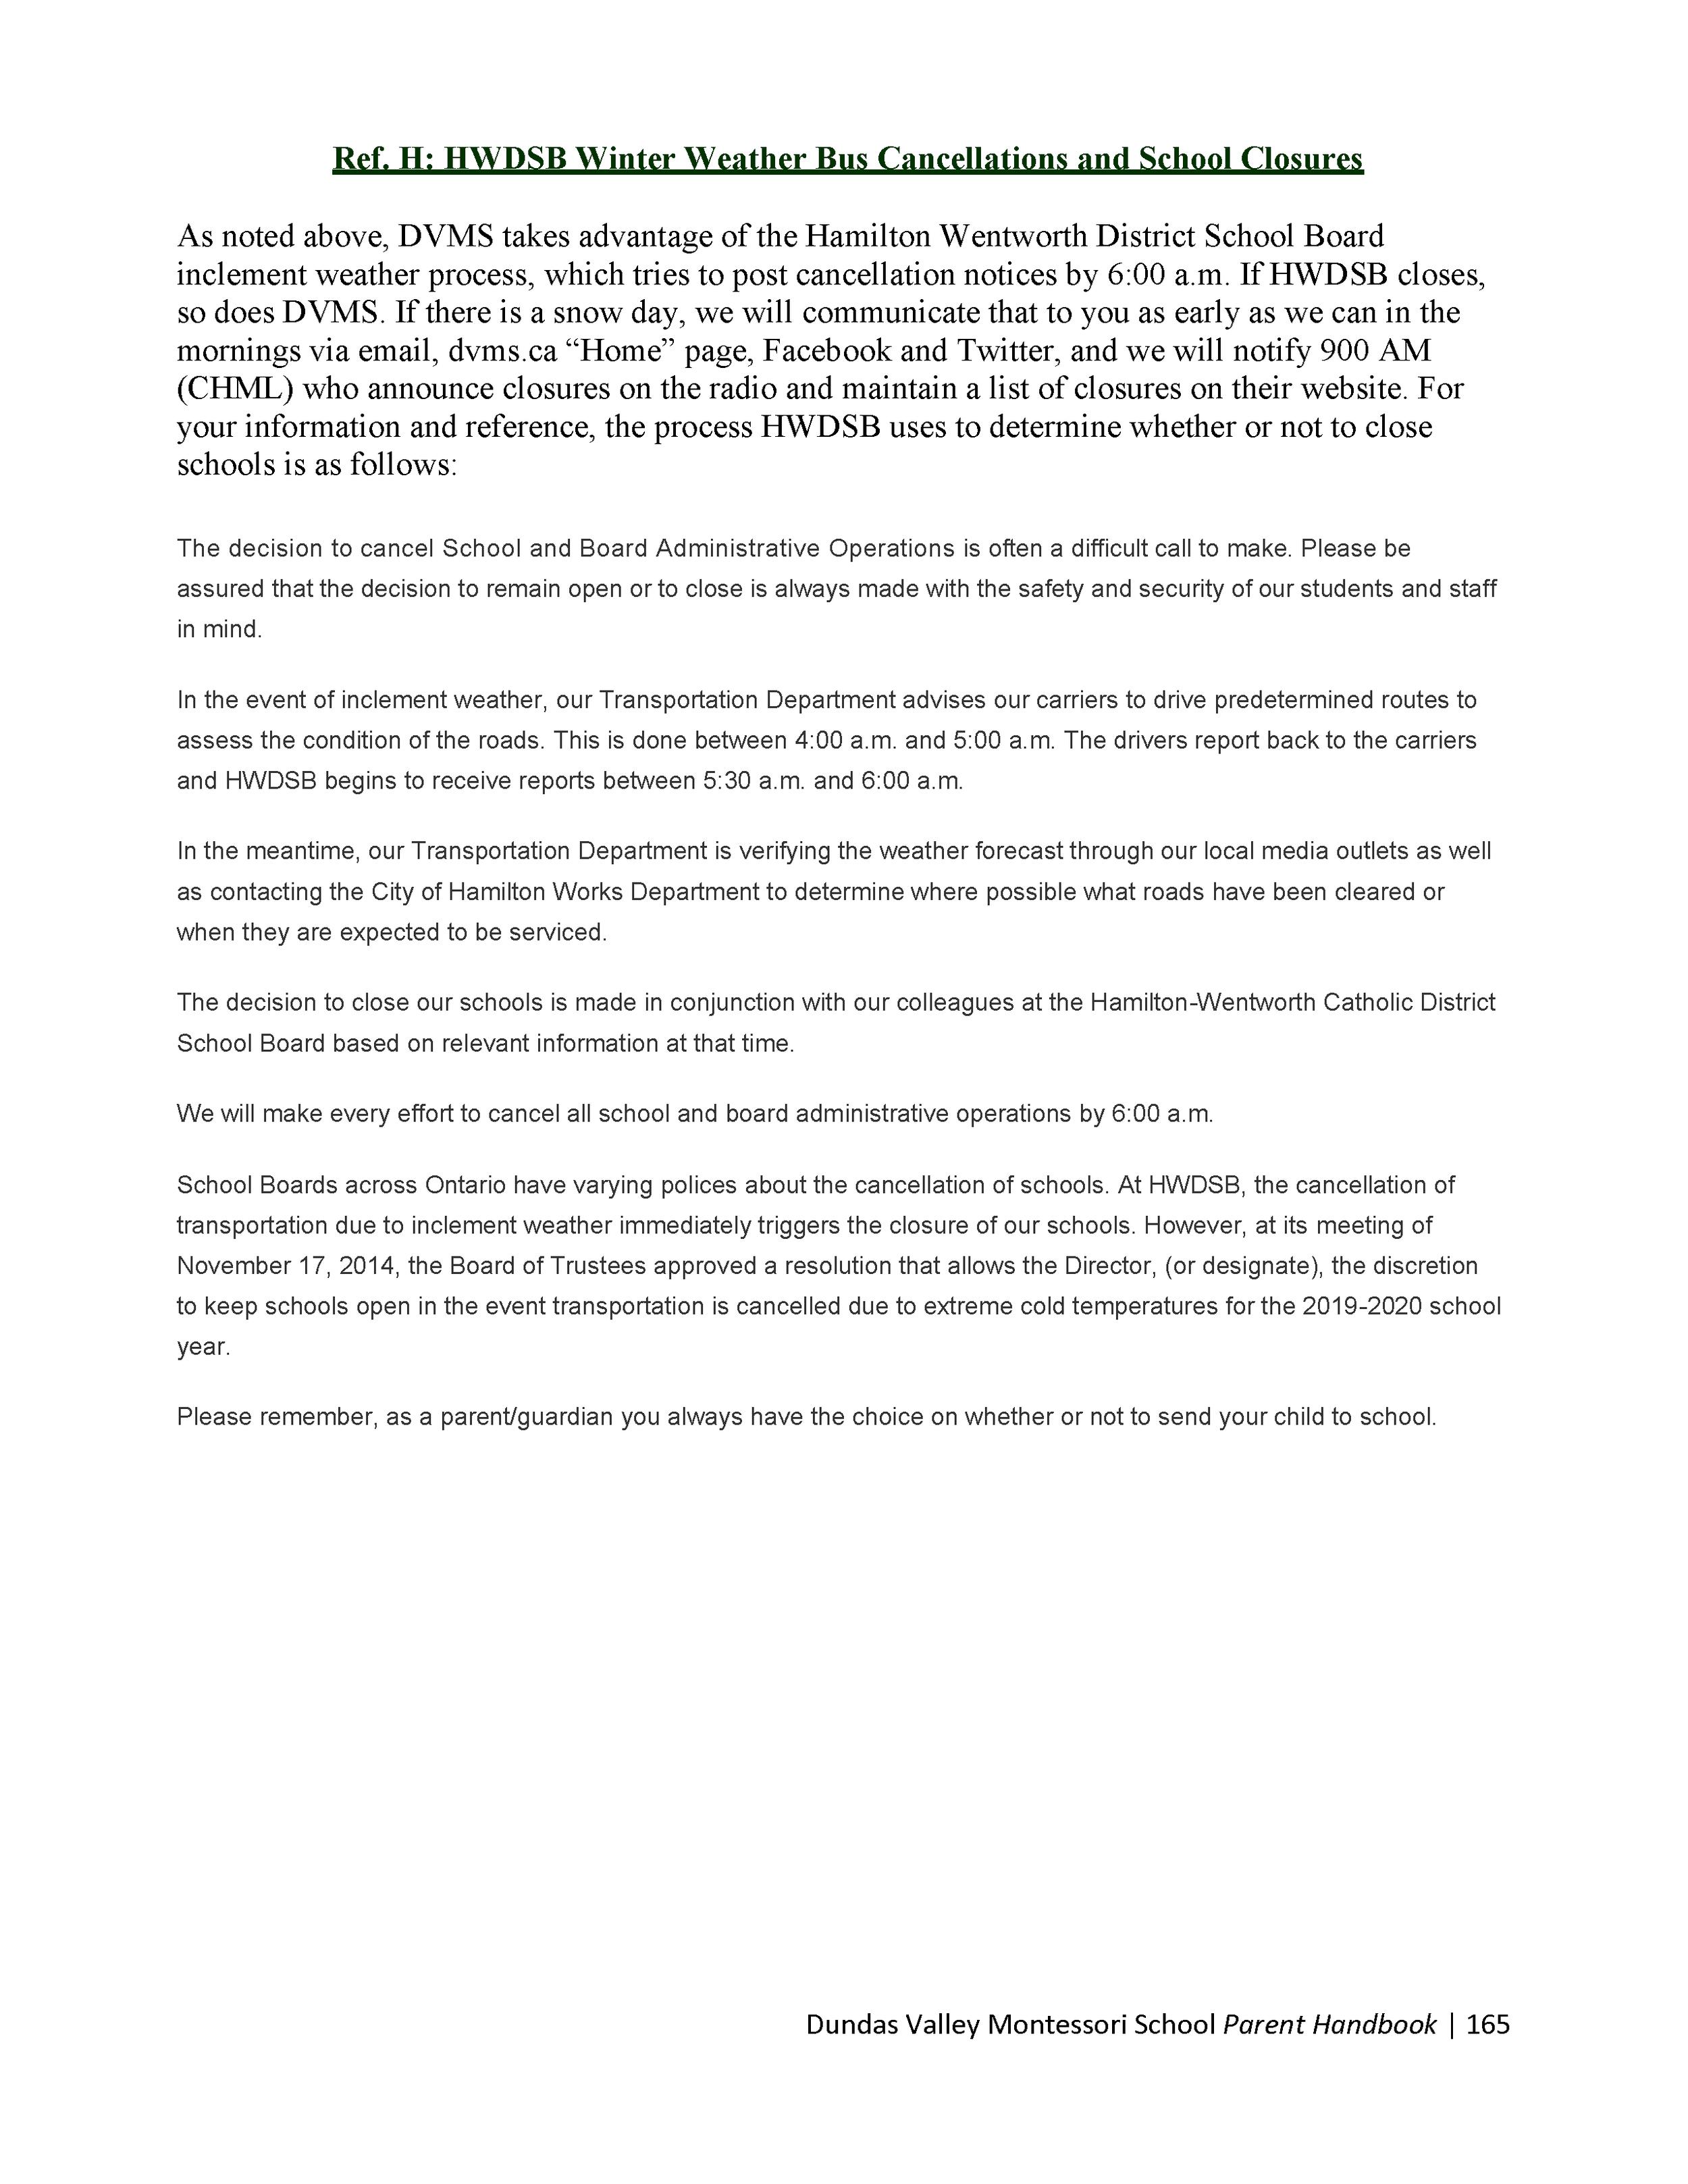 DVMS-Parent-Handbook-19-20_Page_167.png